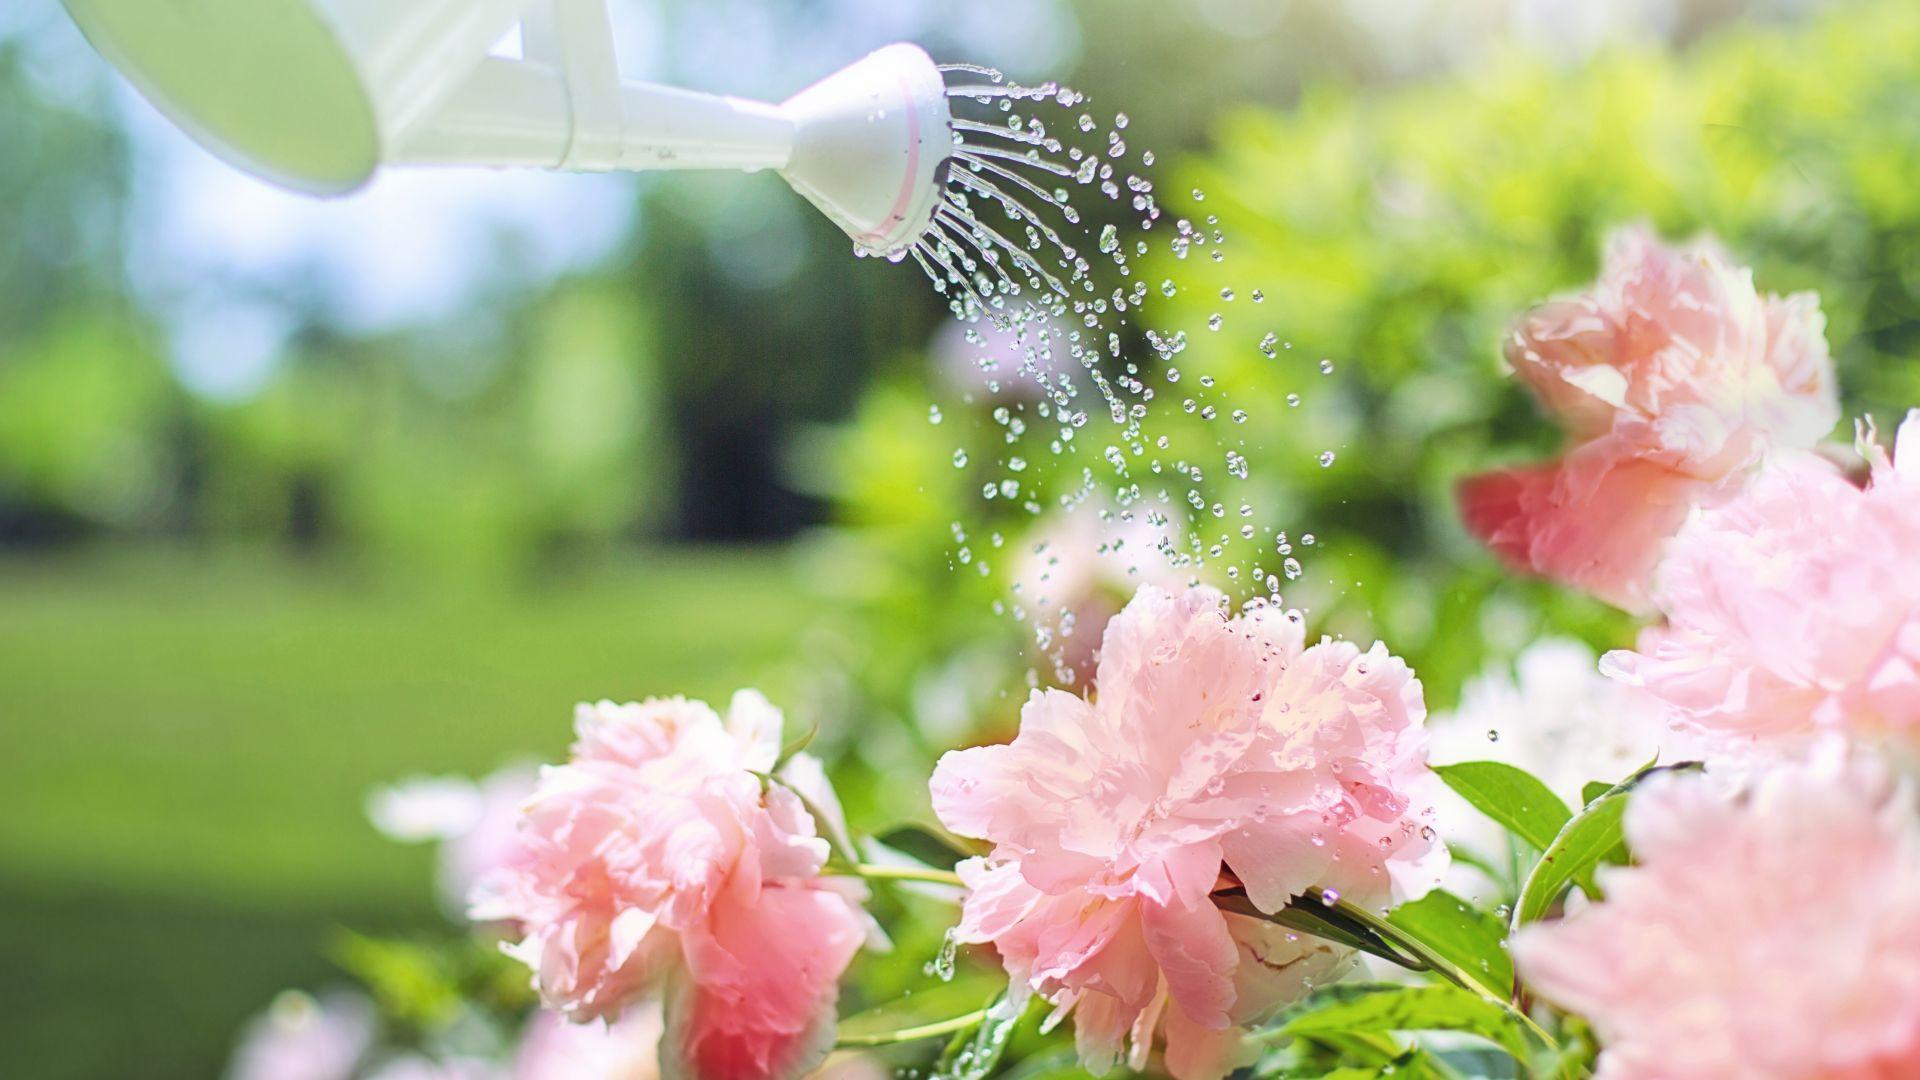 Wallpaper Watering flowers, pink flowers, garden, water